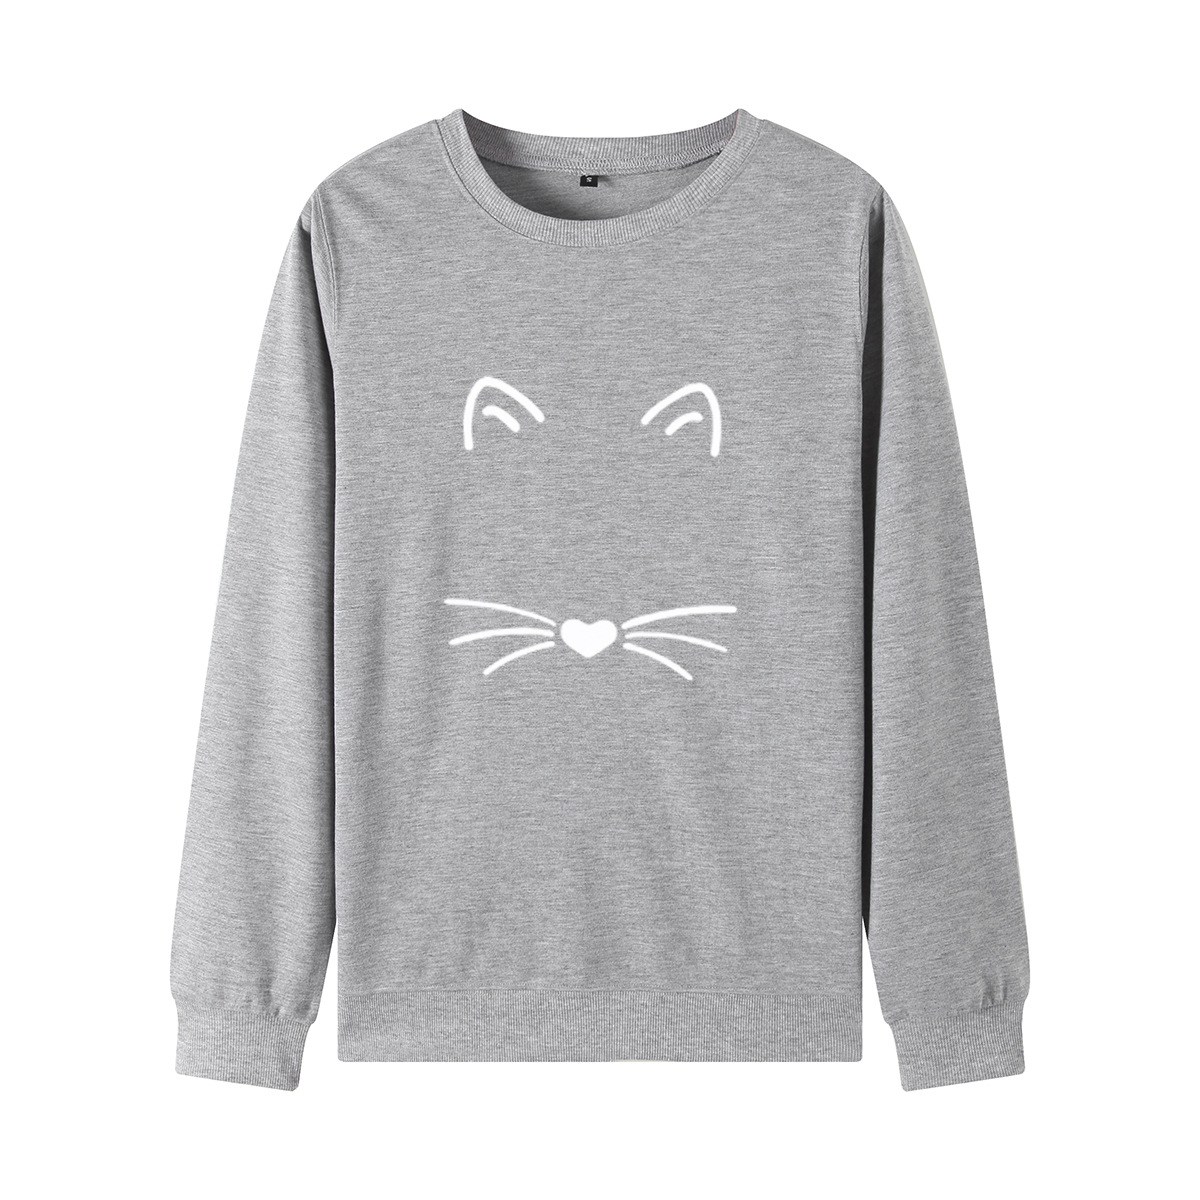 Women's Loose Round Neck Long Sleeve Cat Sweatshirt Jacket 2020